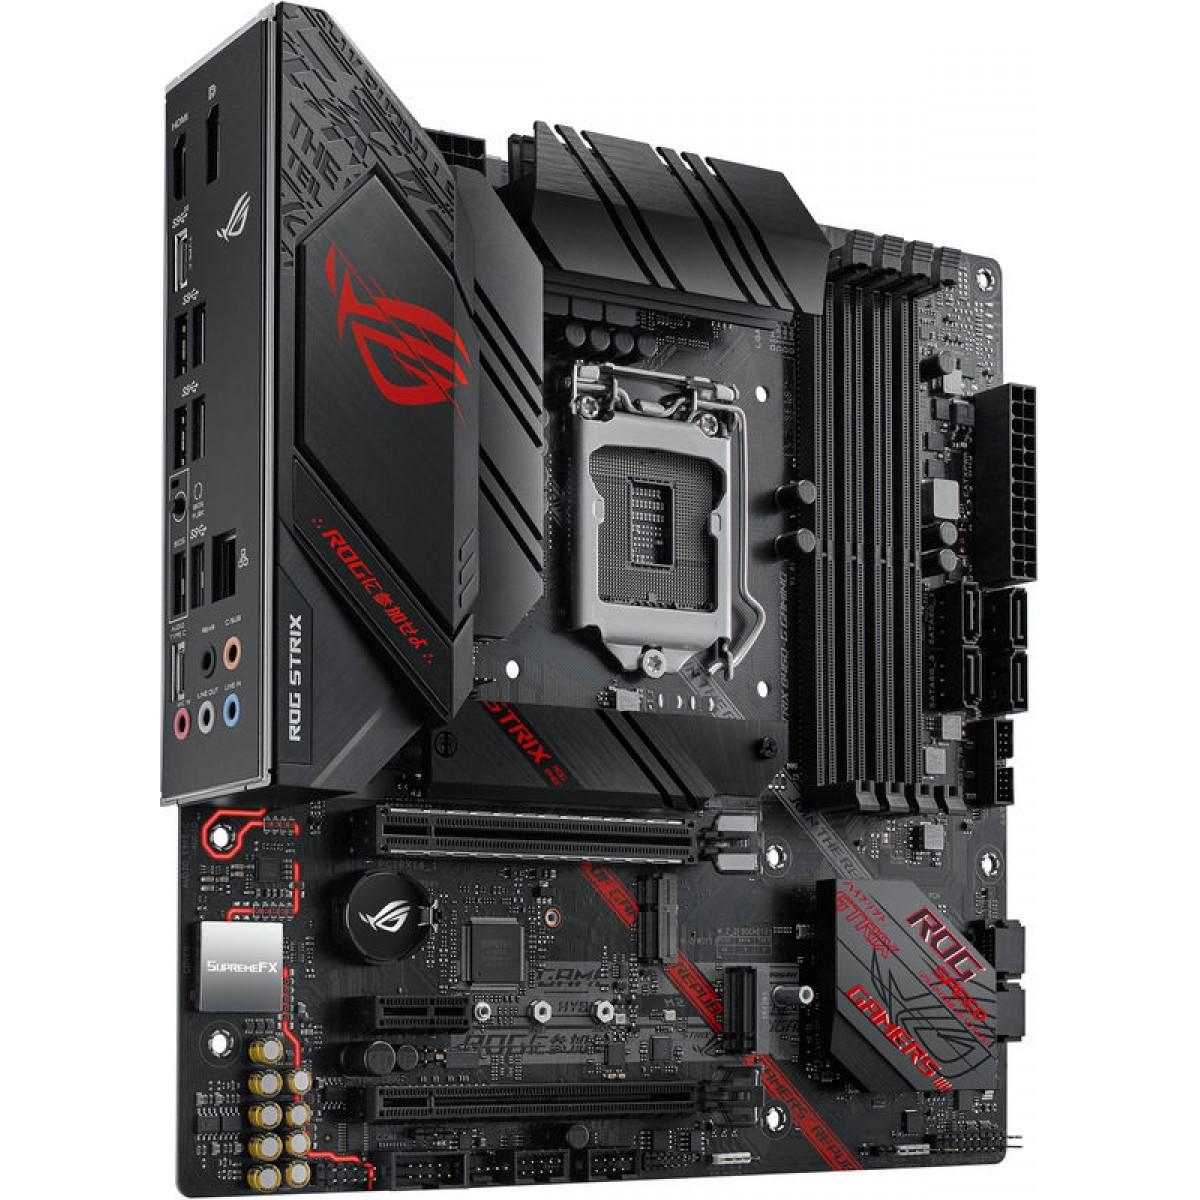 Placa Mãe Asus Rog Strix B460-G Gaming, Chipset B460, Intel LGA 1200, mATX, DDR4